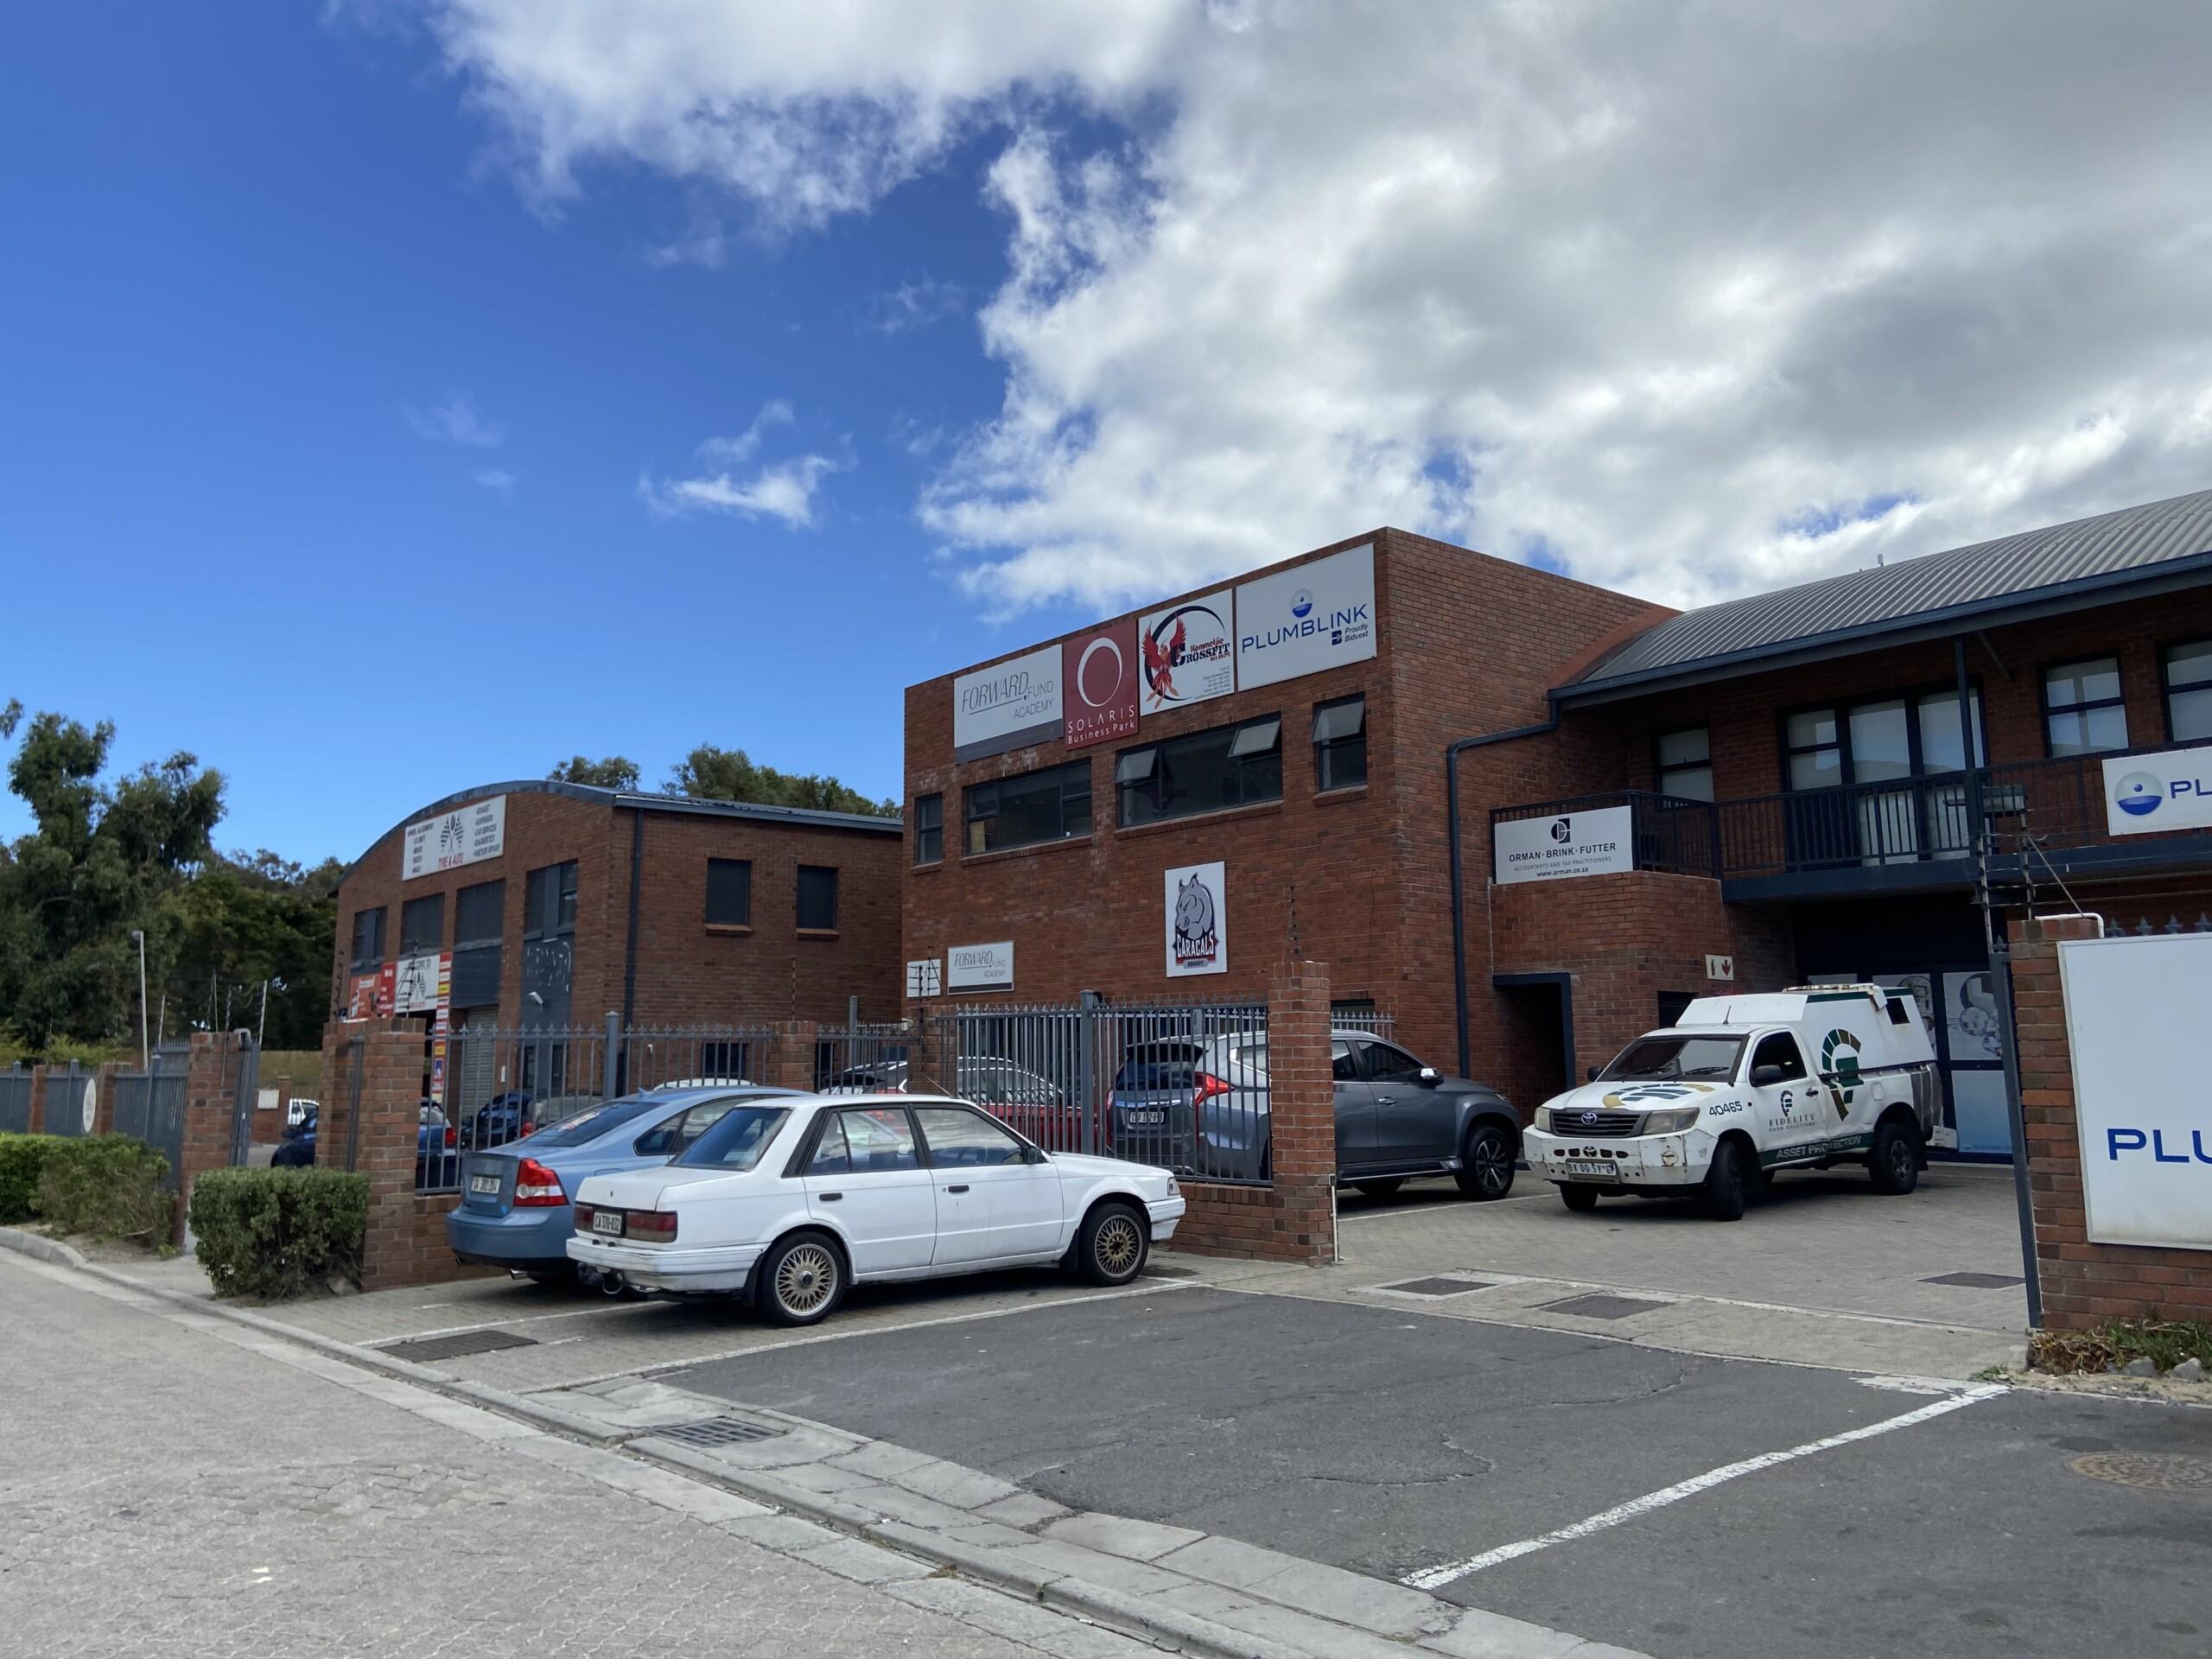 rooted-properties-warehouse-tolet-forrent-capetown-industrial-sunnydale-noordhoek-solaris-best-top-commercial-property-brokers-CPT16